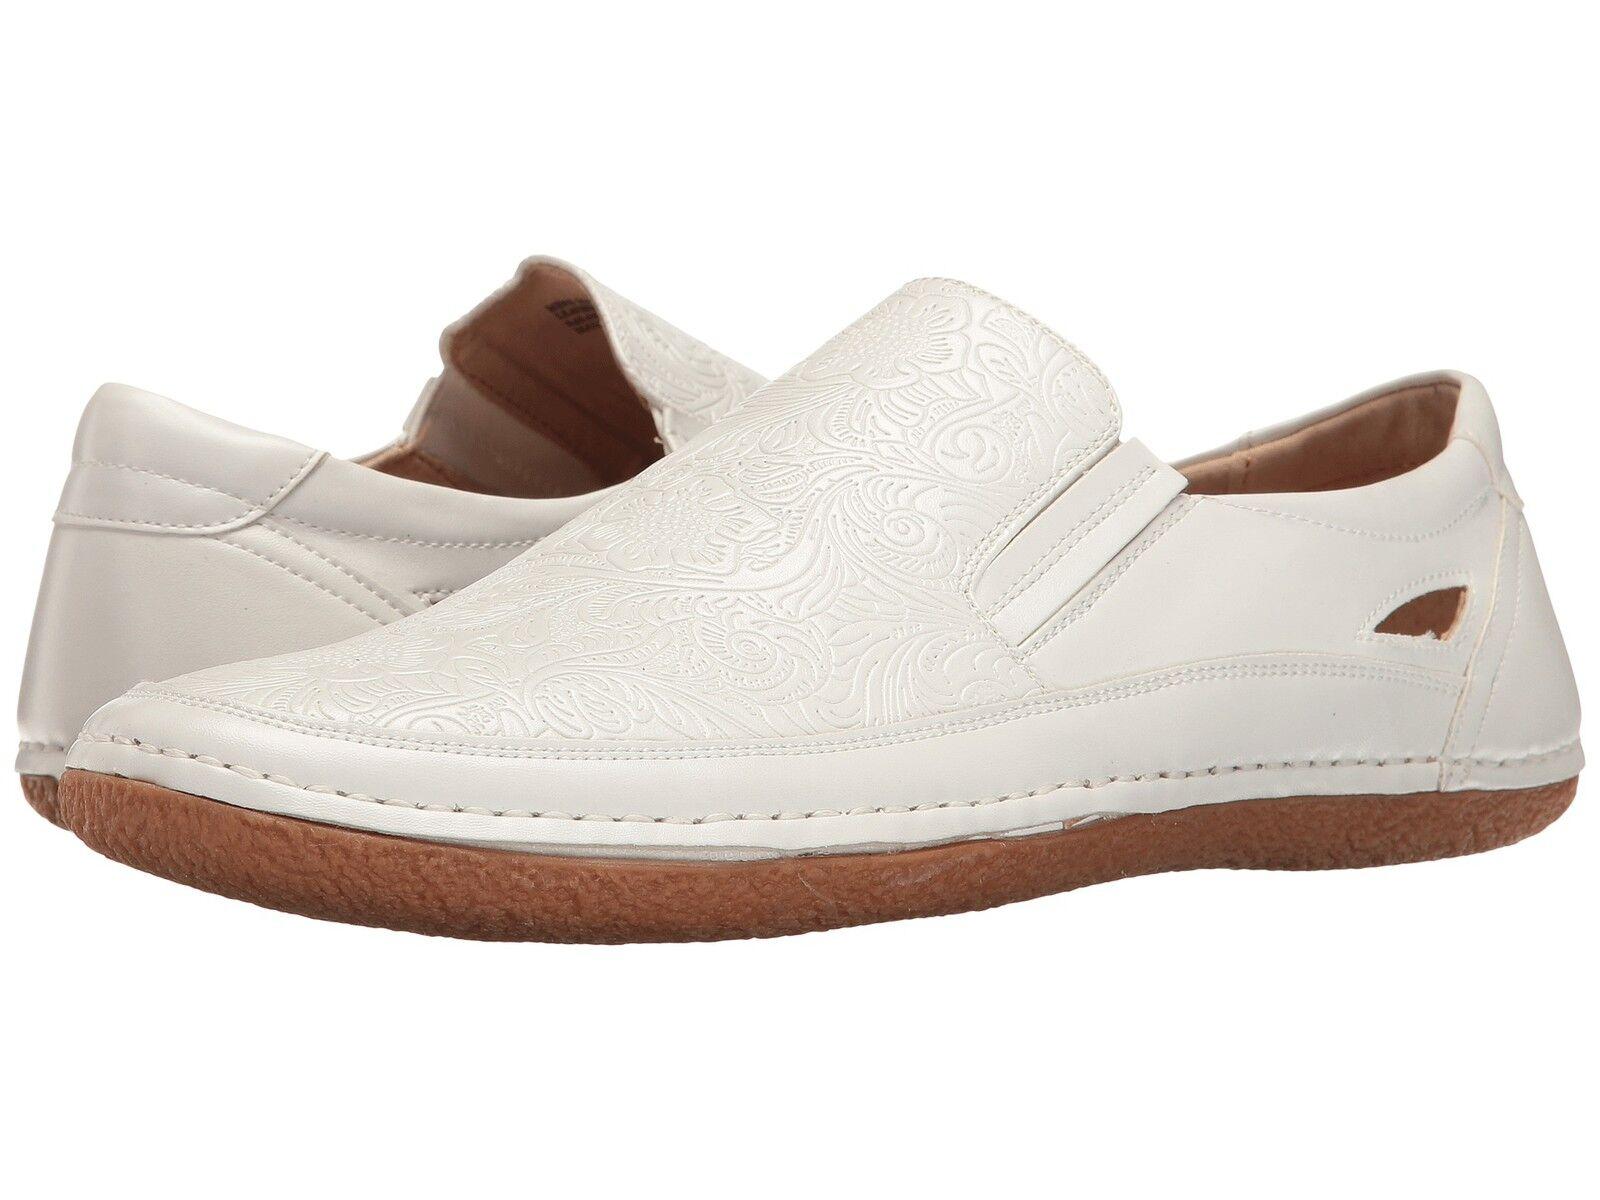 Stacy-Adams Men's NAPA Moc toe slip-on White shoes 25096-100